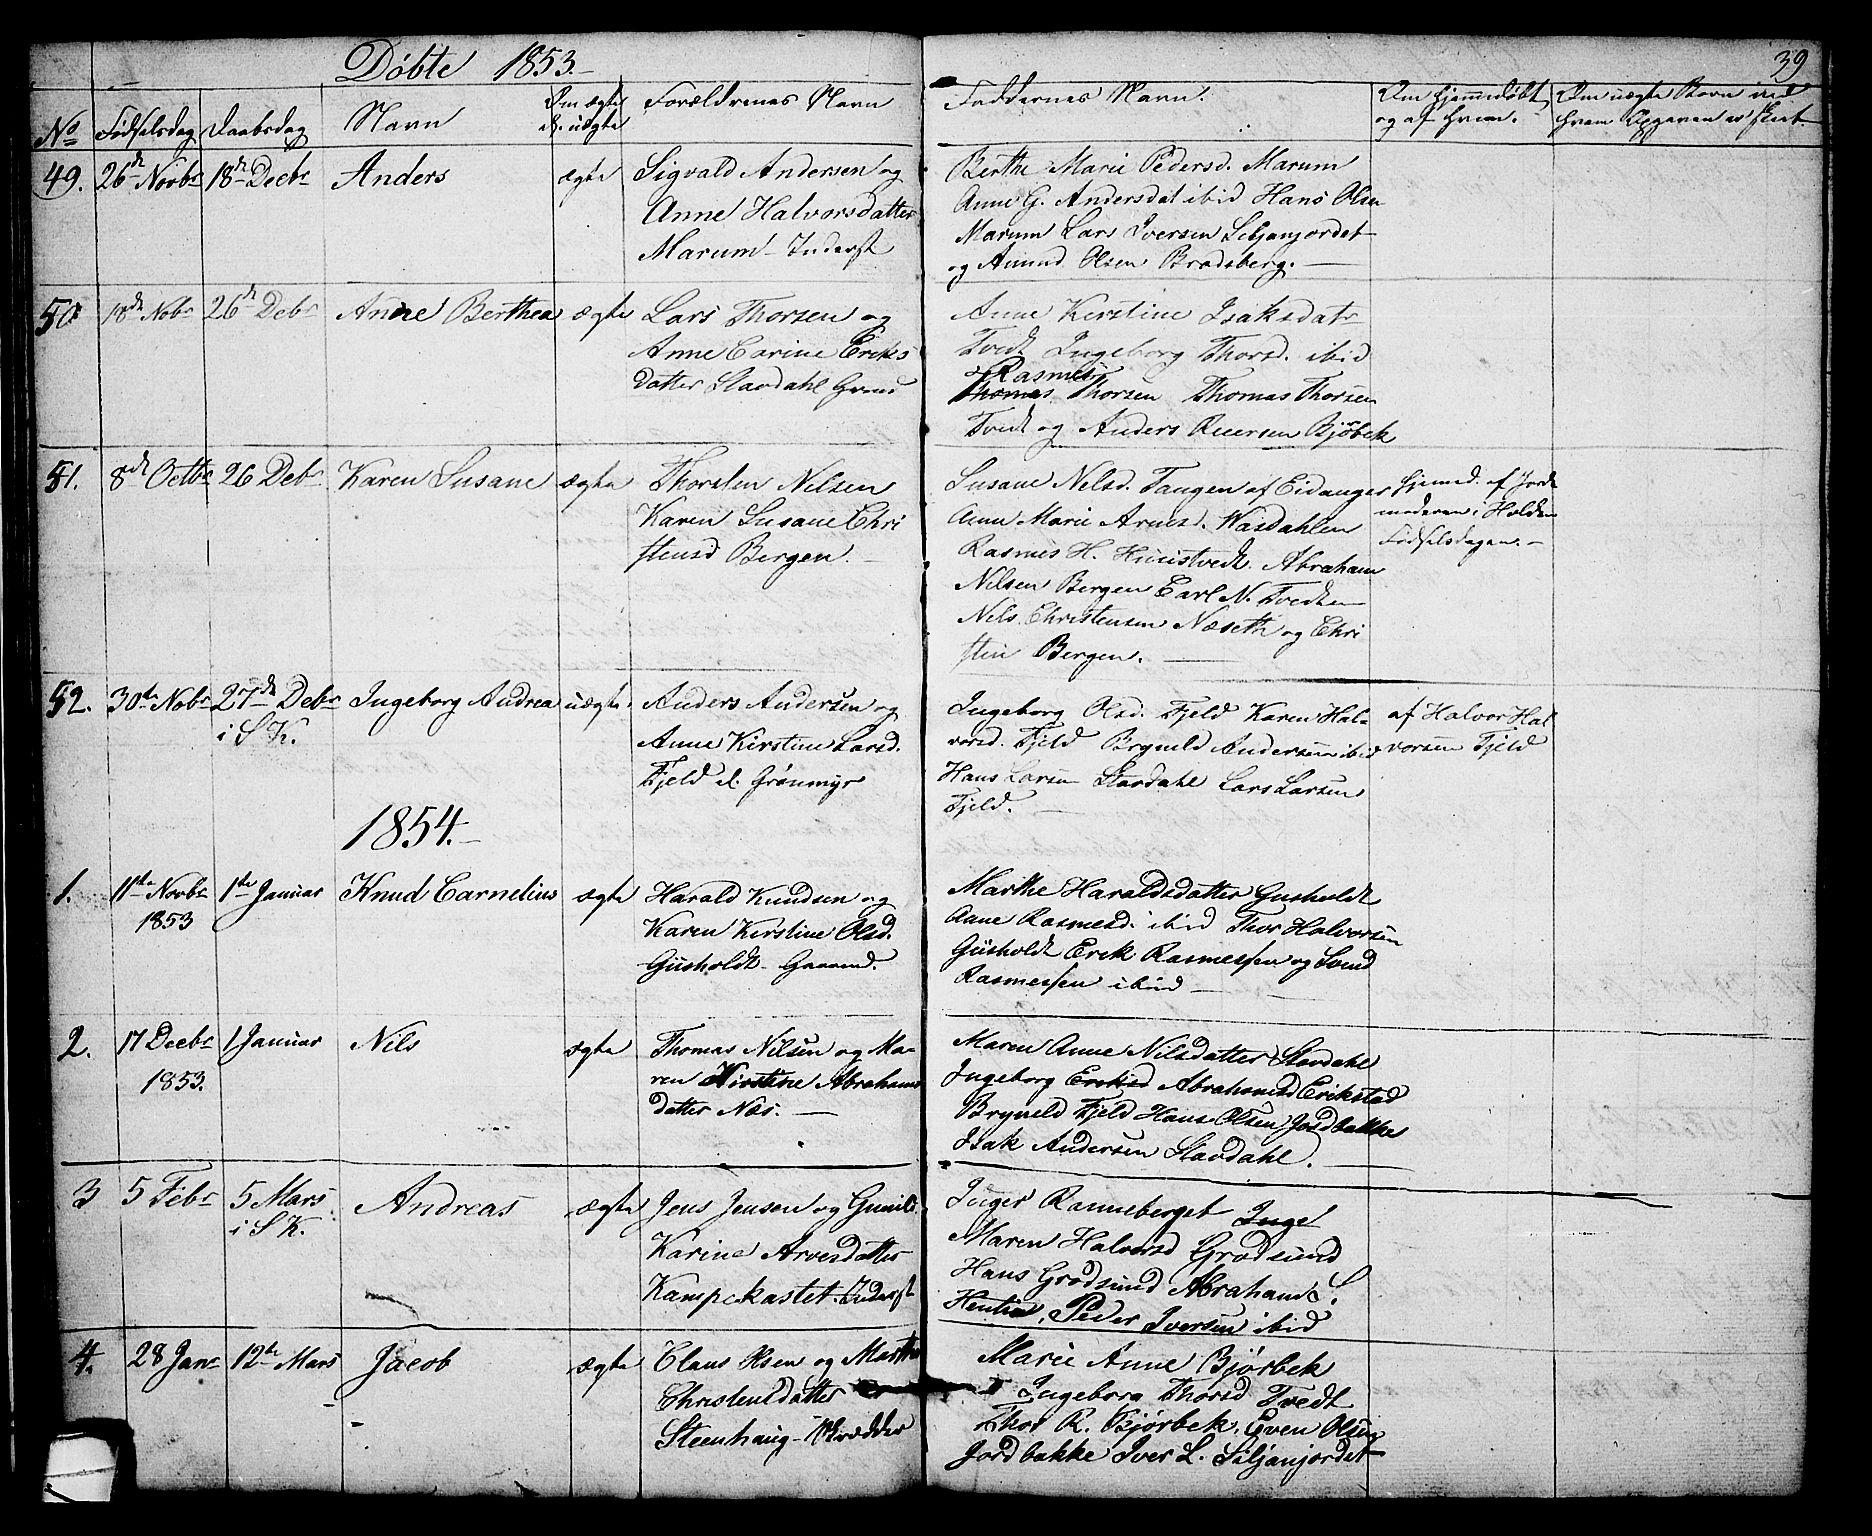 SAKO, Solum kirkebøker, G/Gb/L0001: Klokkerbok nr. II 1, 1848-1859, s. 39